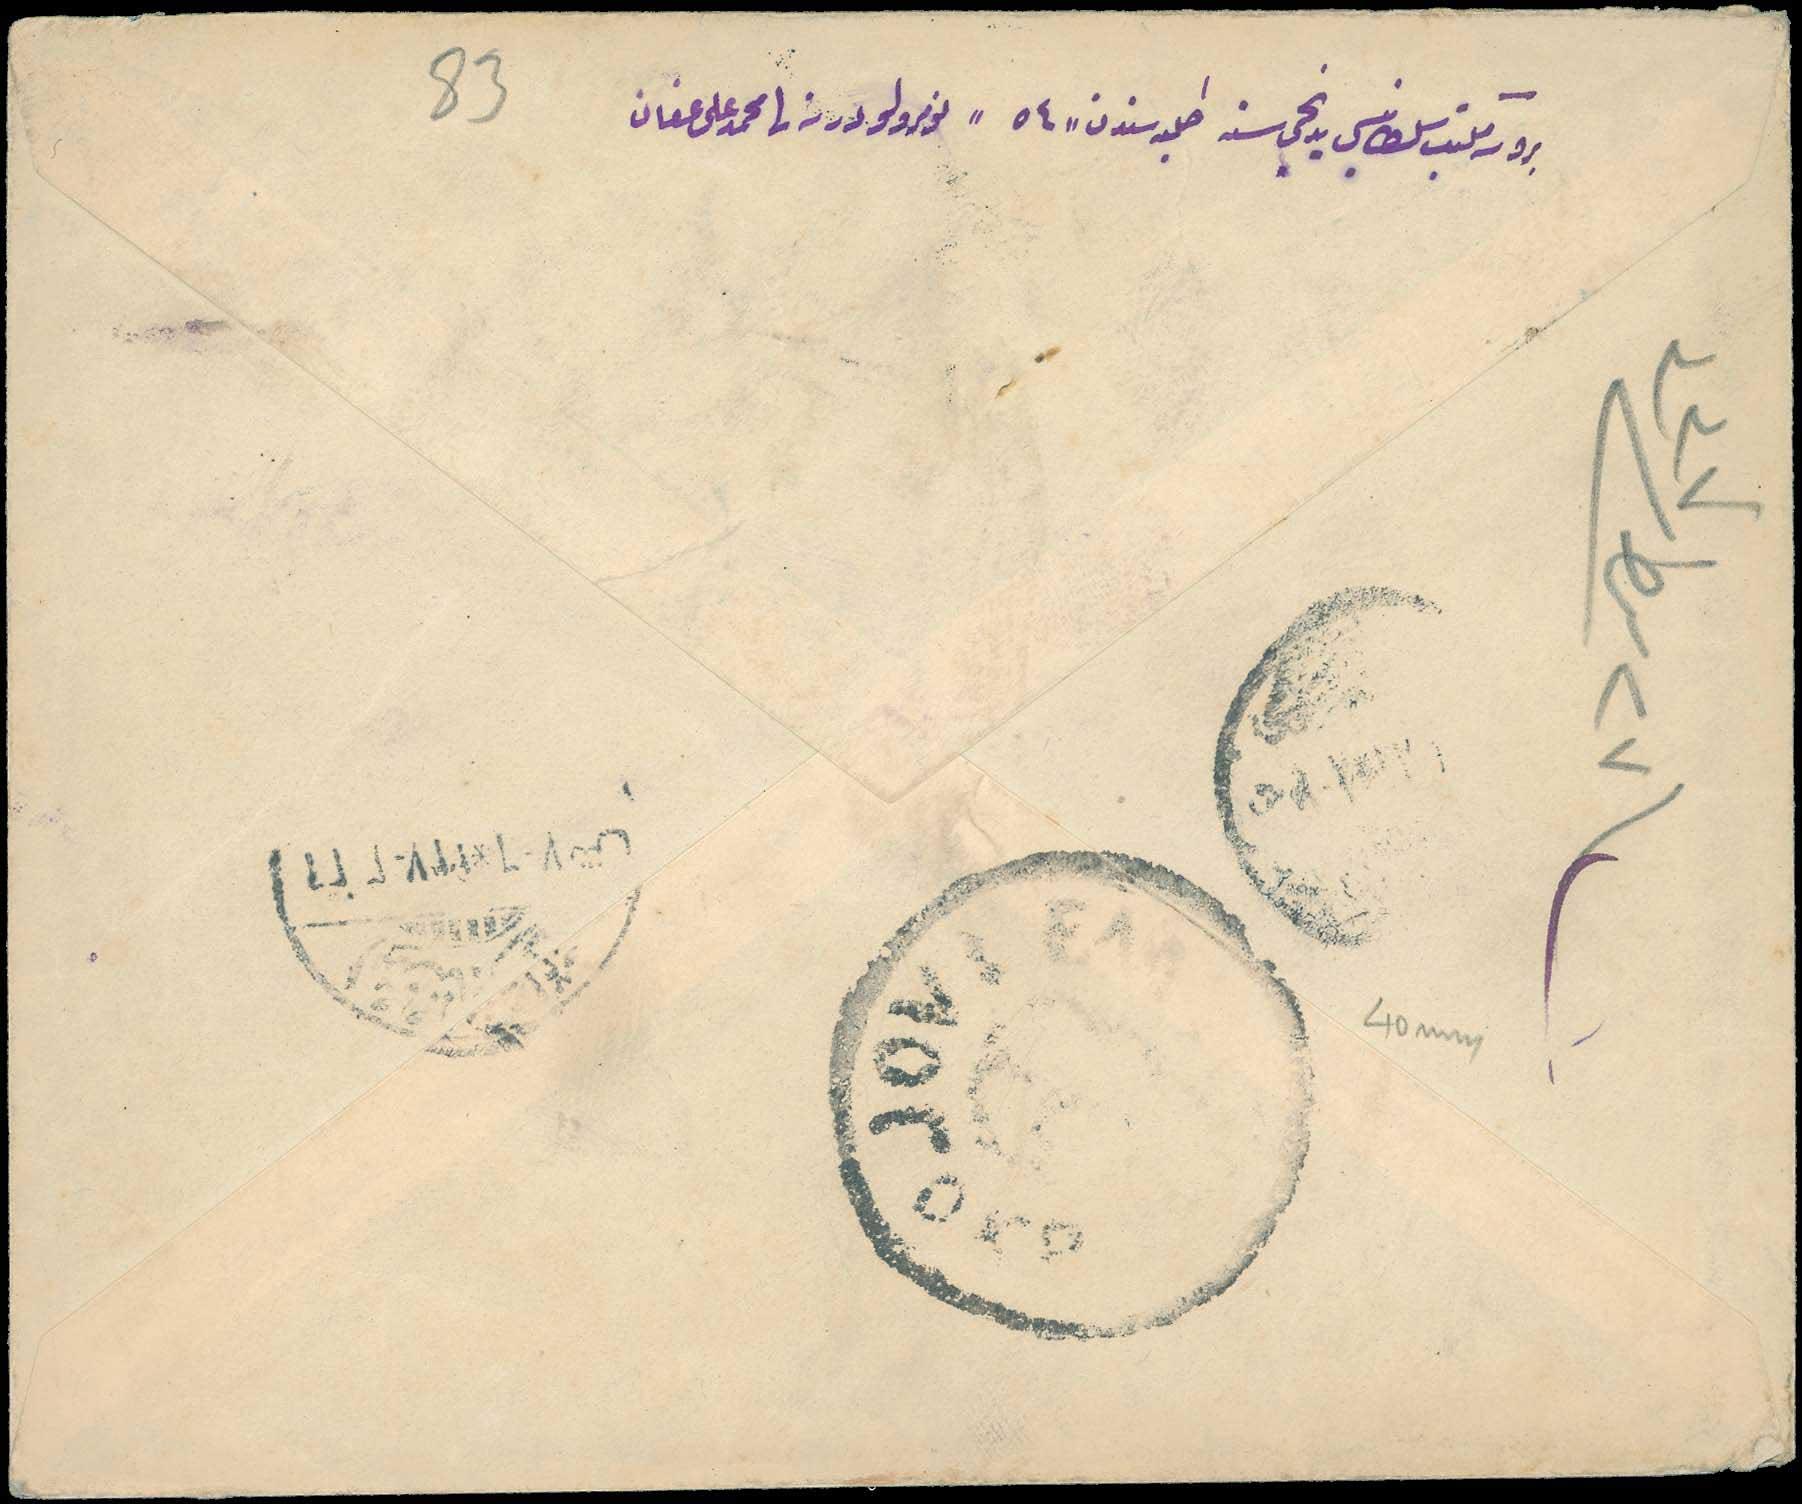 Lot 798 - -  SMYRNE,CONS/PLE & ASIA MINOR (before 1922) SMYRNE,CONS/PLE & ASIA MINOR (before 1922) -  A. Karamitsos Postal & Live Internet Auction 681 General Philatelic Auction